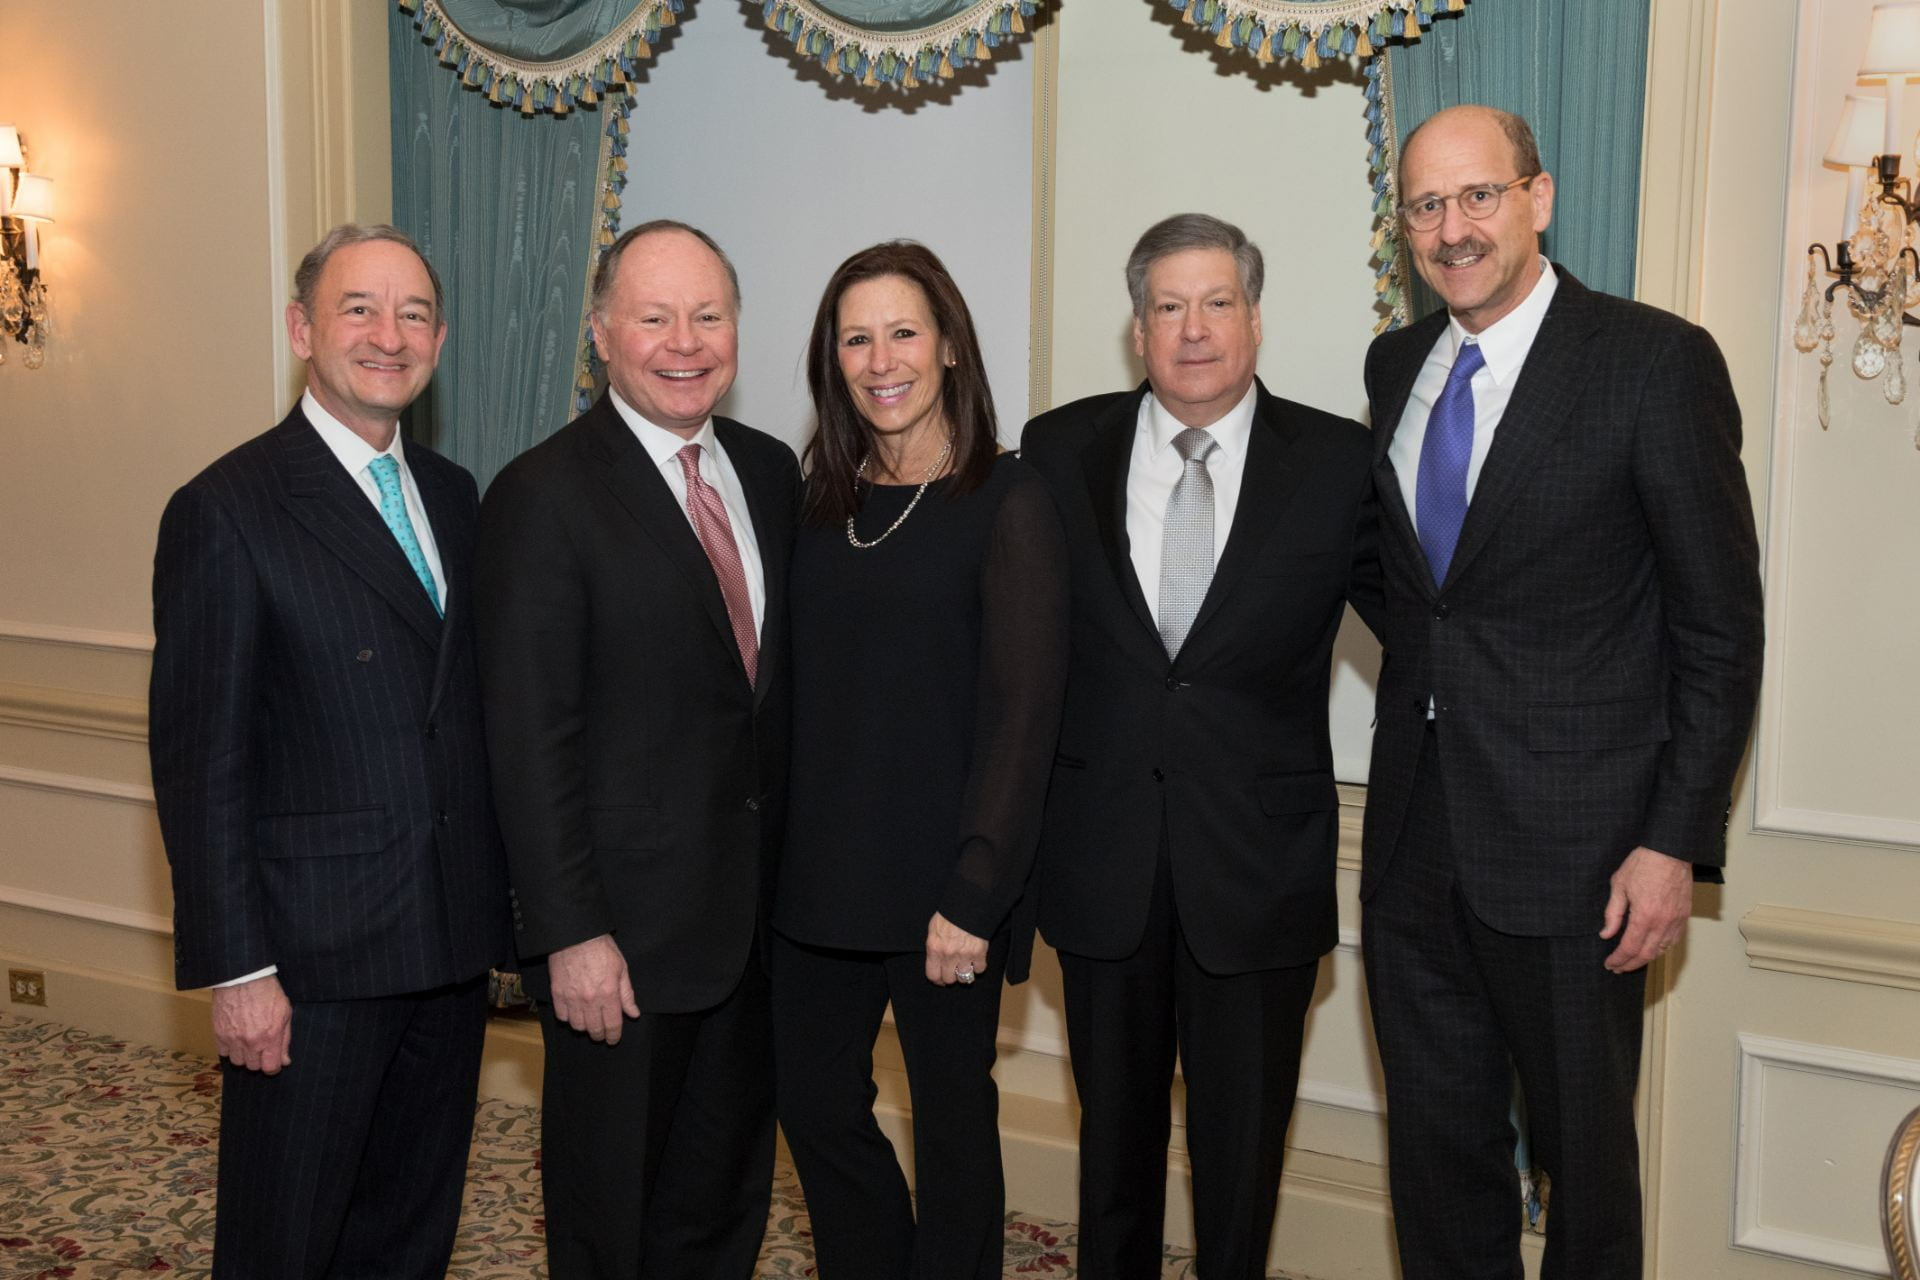 Chancellor Wrighton, Andy Bursky, Jane Bursky, Bob Schreiber, and Dean Perlmutter